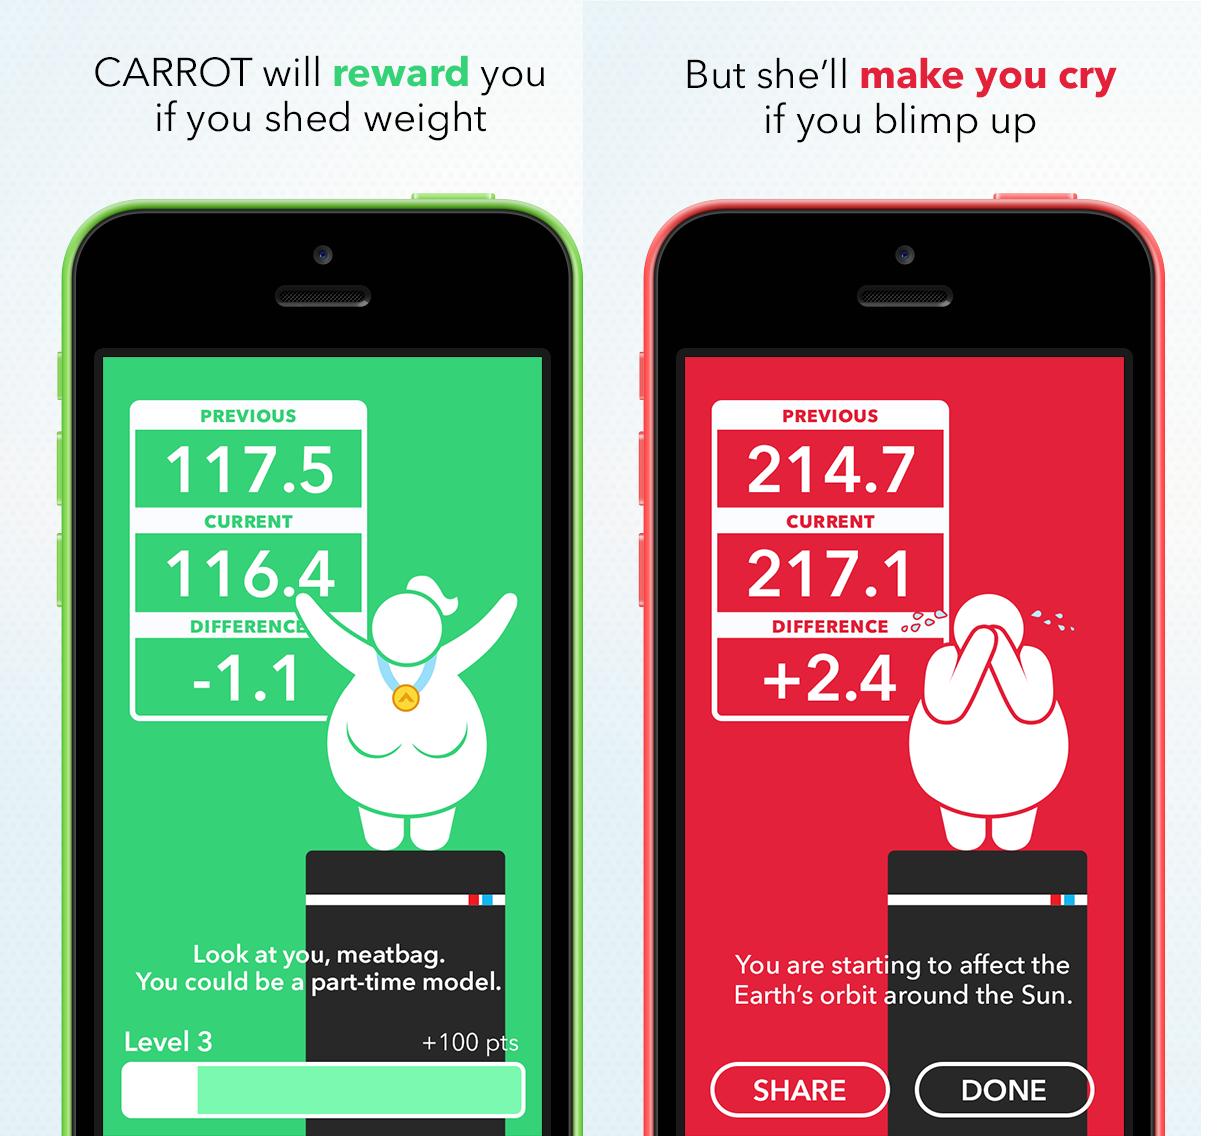 CARROT Fit iOS app